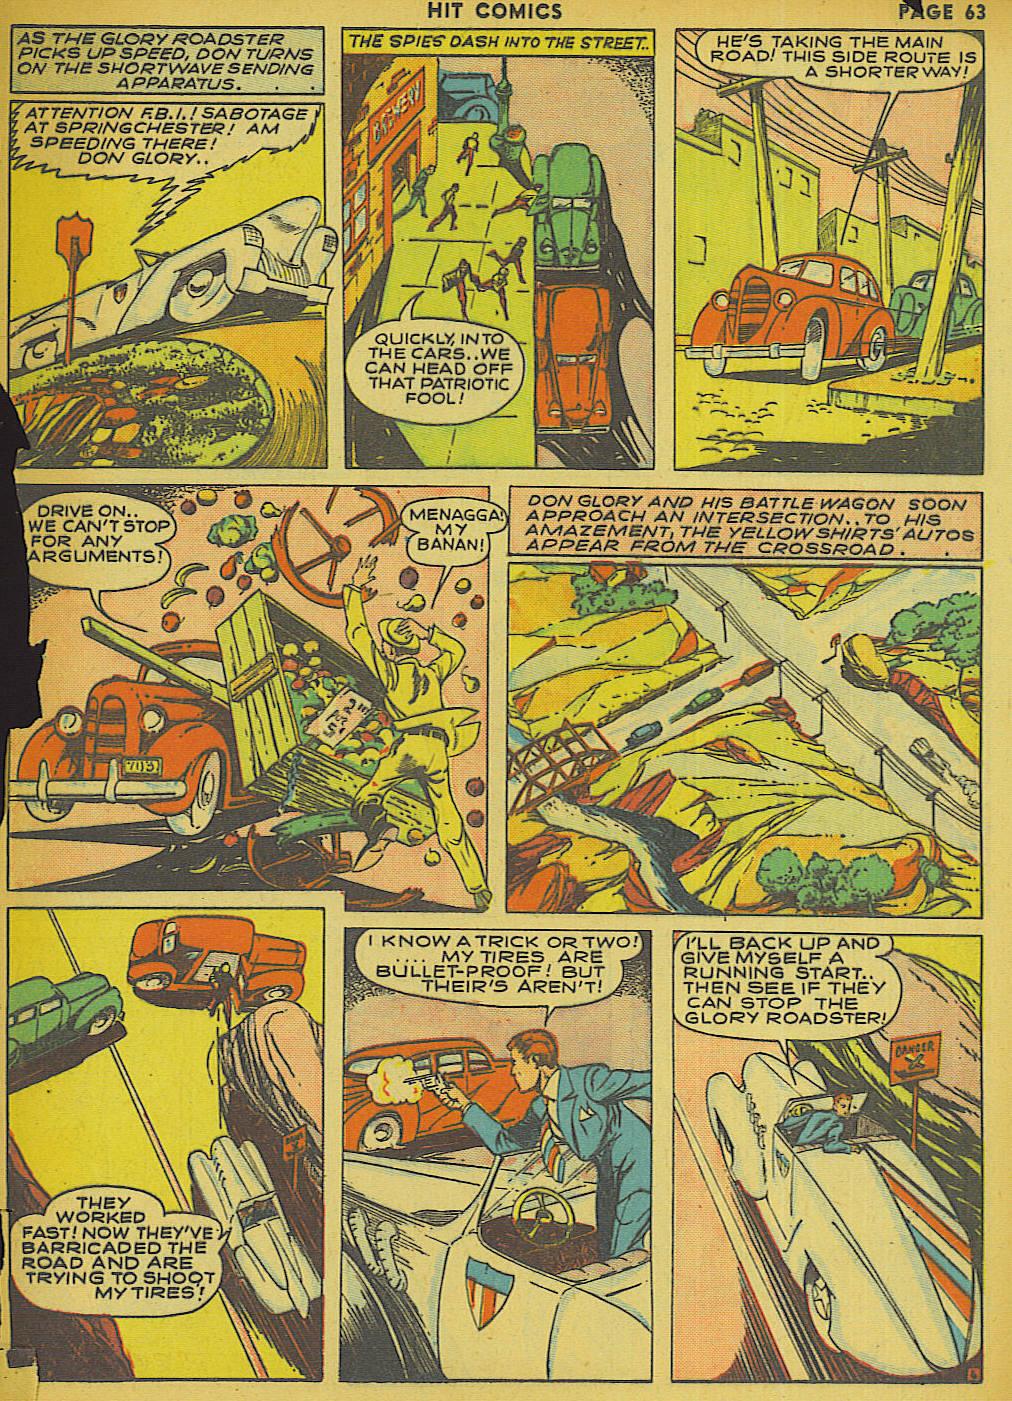 Read online Hit Comics comic -  Issue #13 - 65